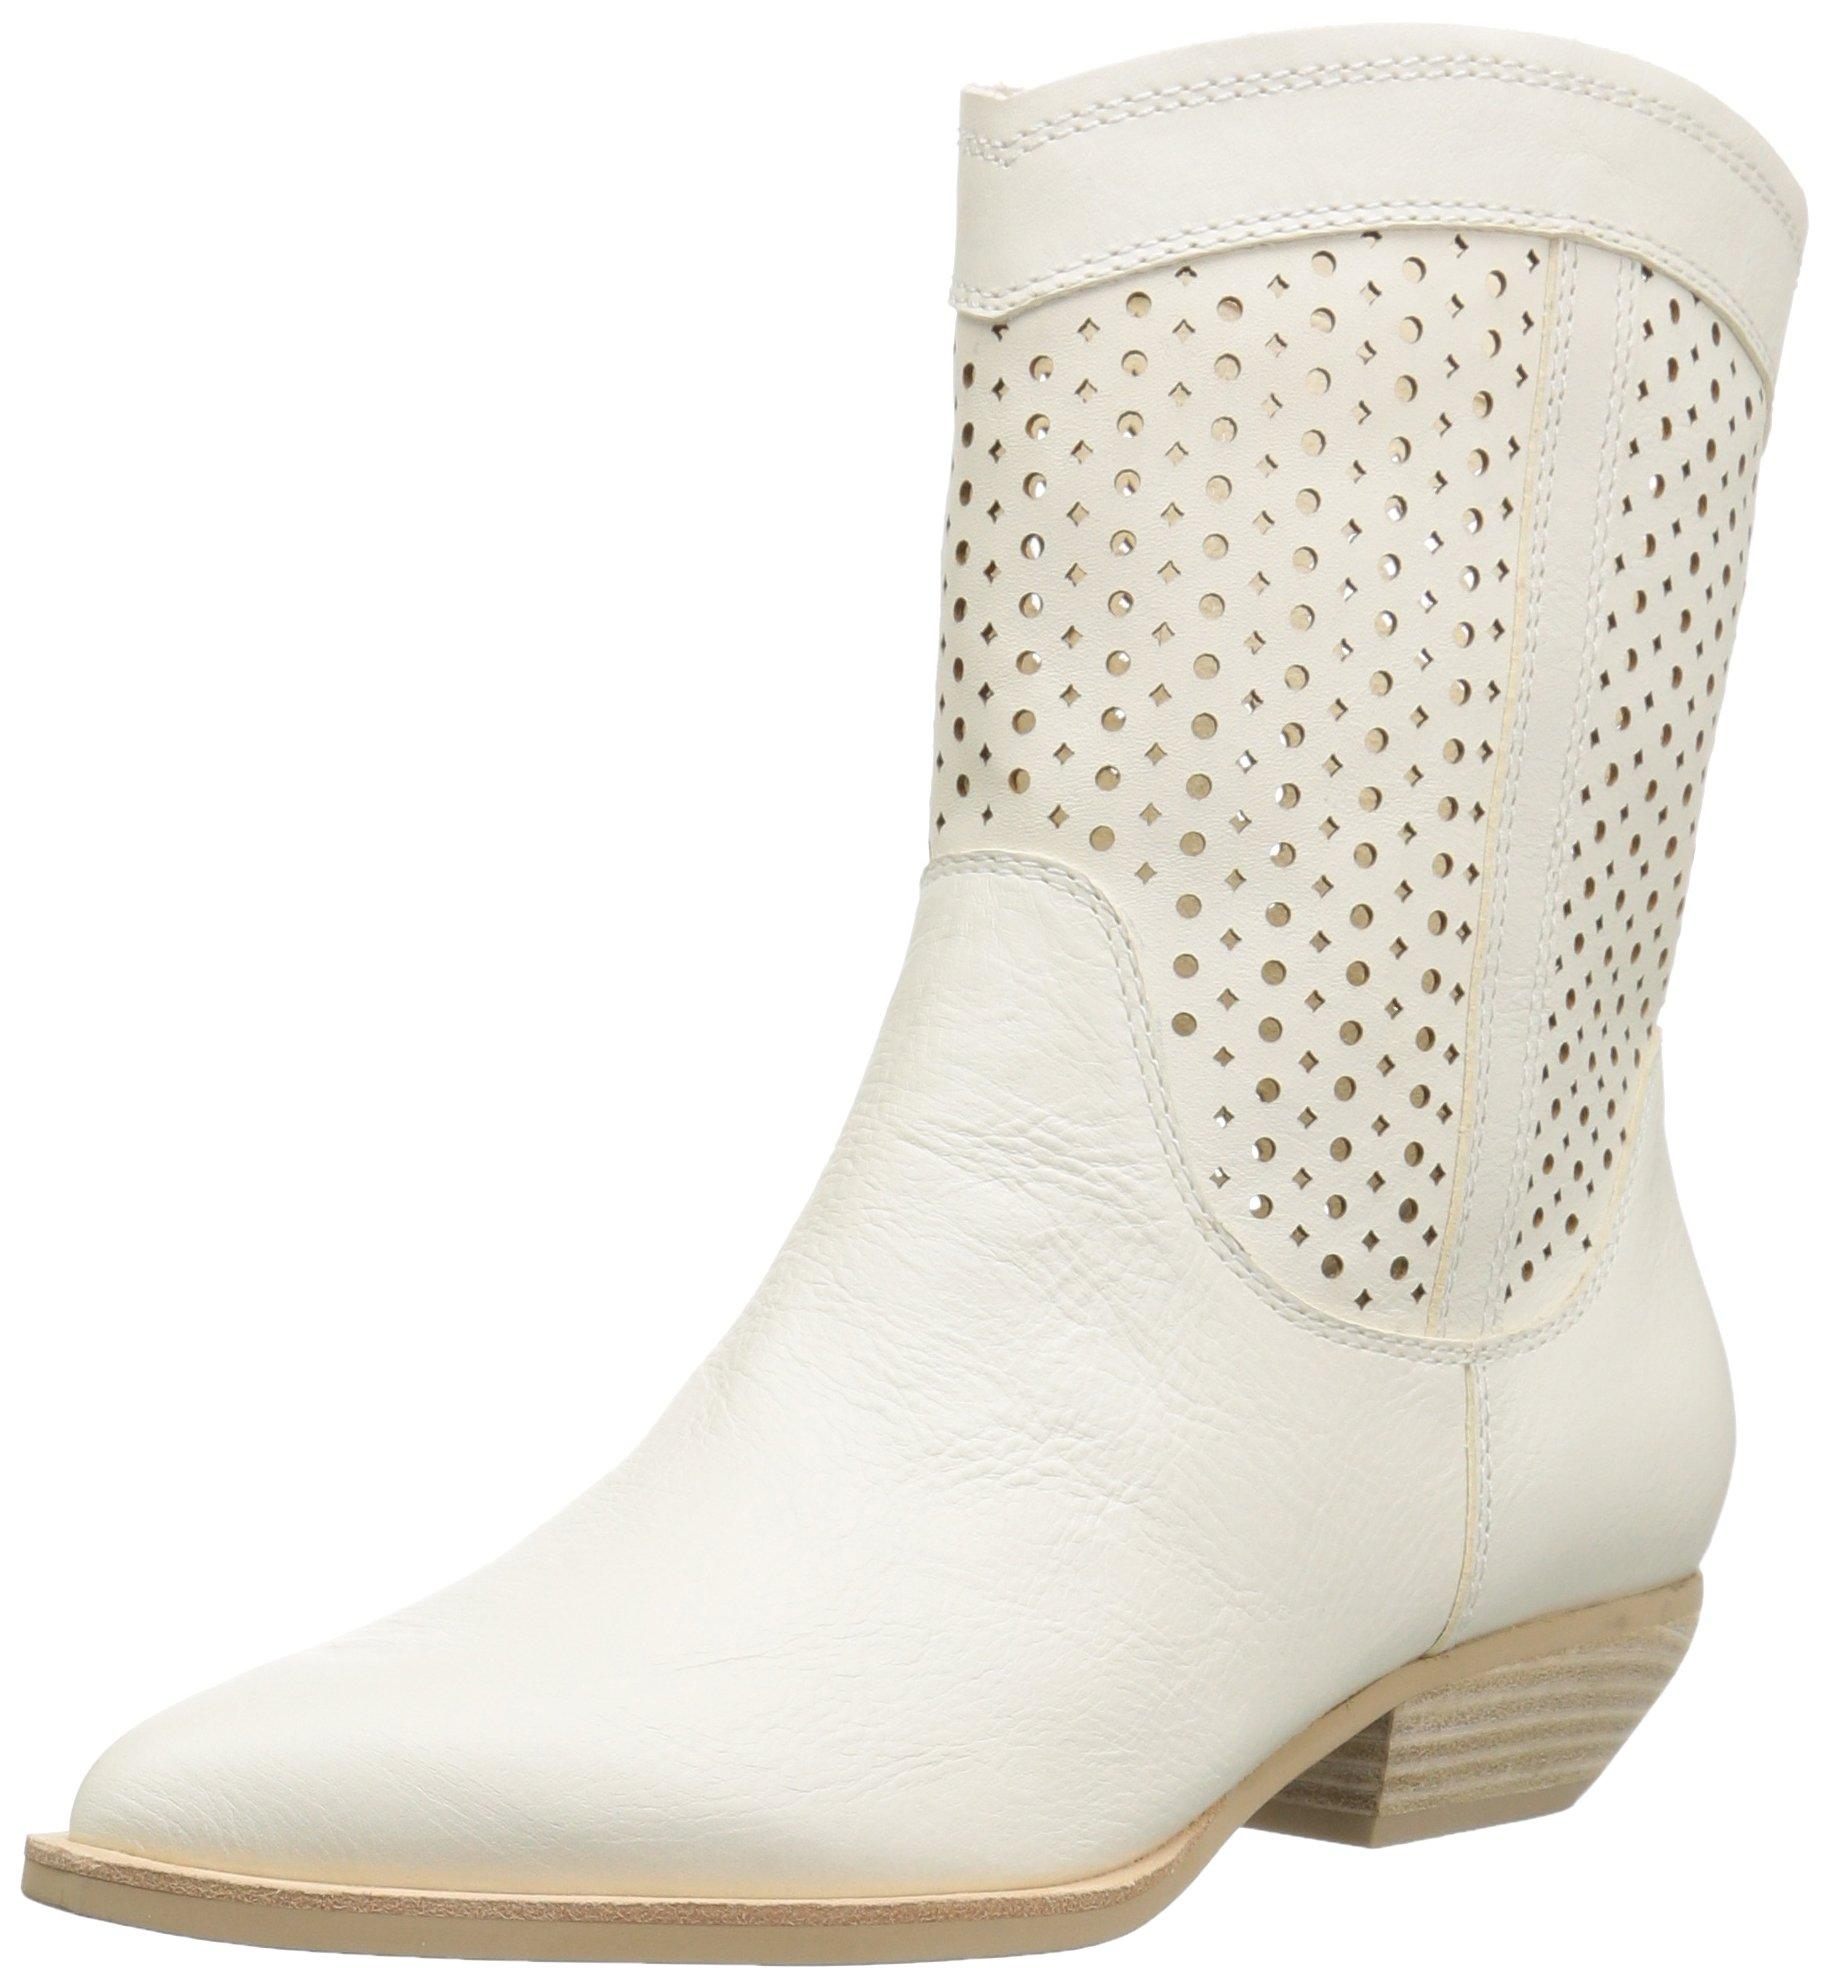 Dolce Vita Women's Union Fashion Boot, Off White Leather, 7.5 M US